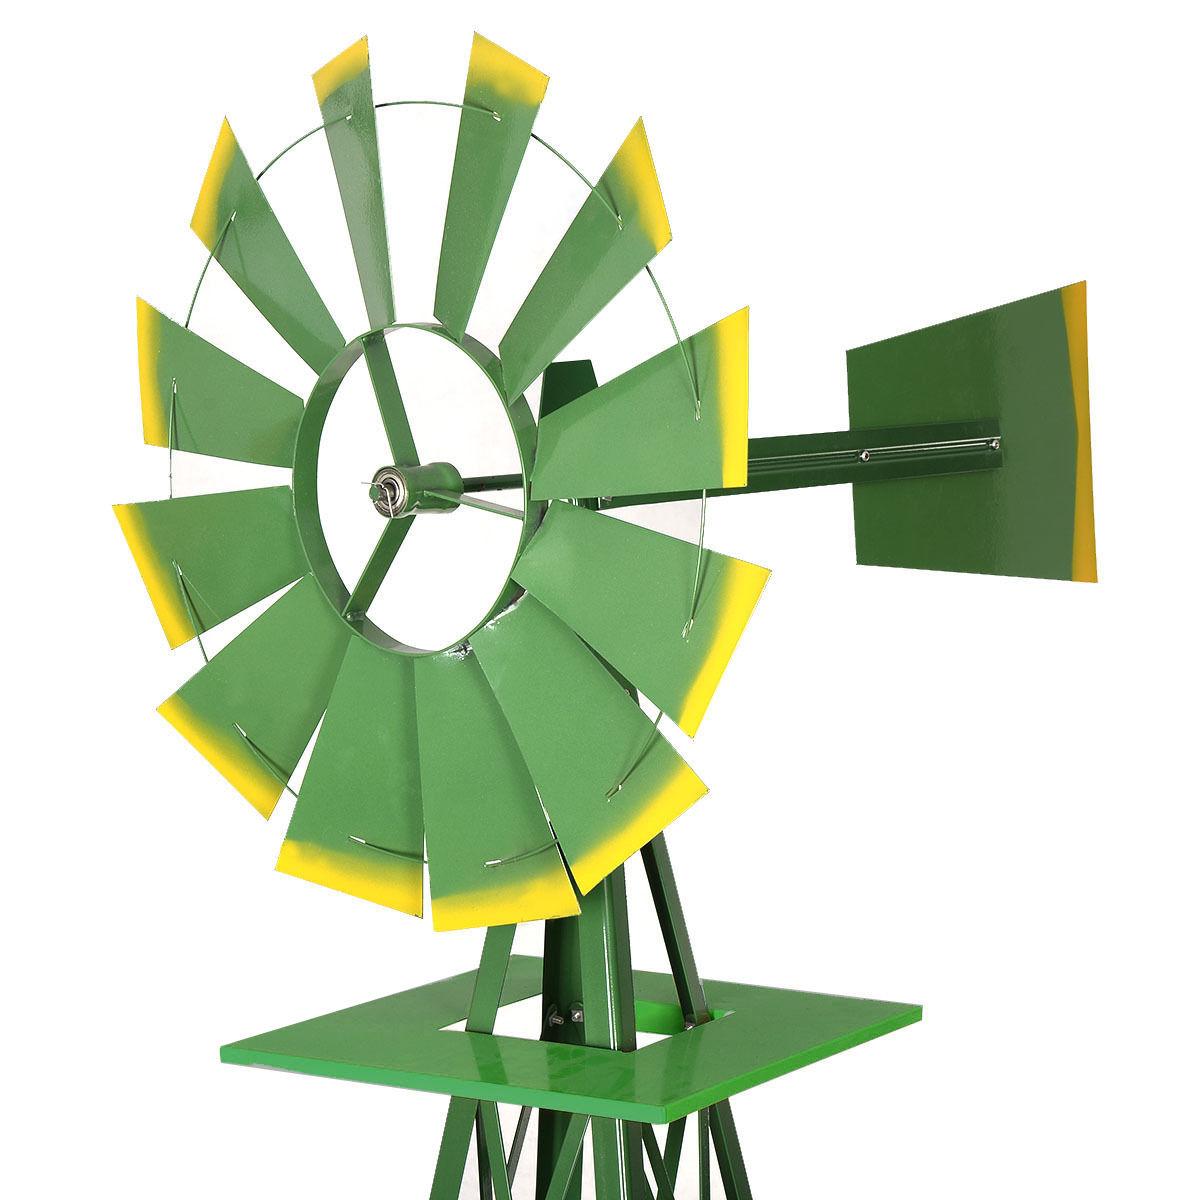 Costway 8Ft Tall Windmill Ornamental Wind Wheel Silver Green And ...